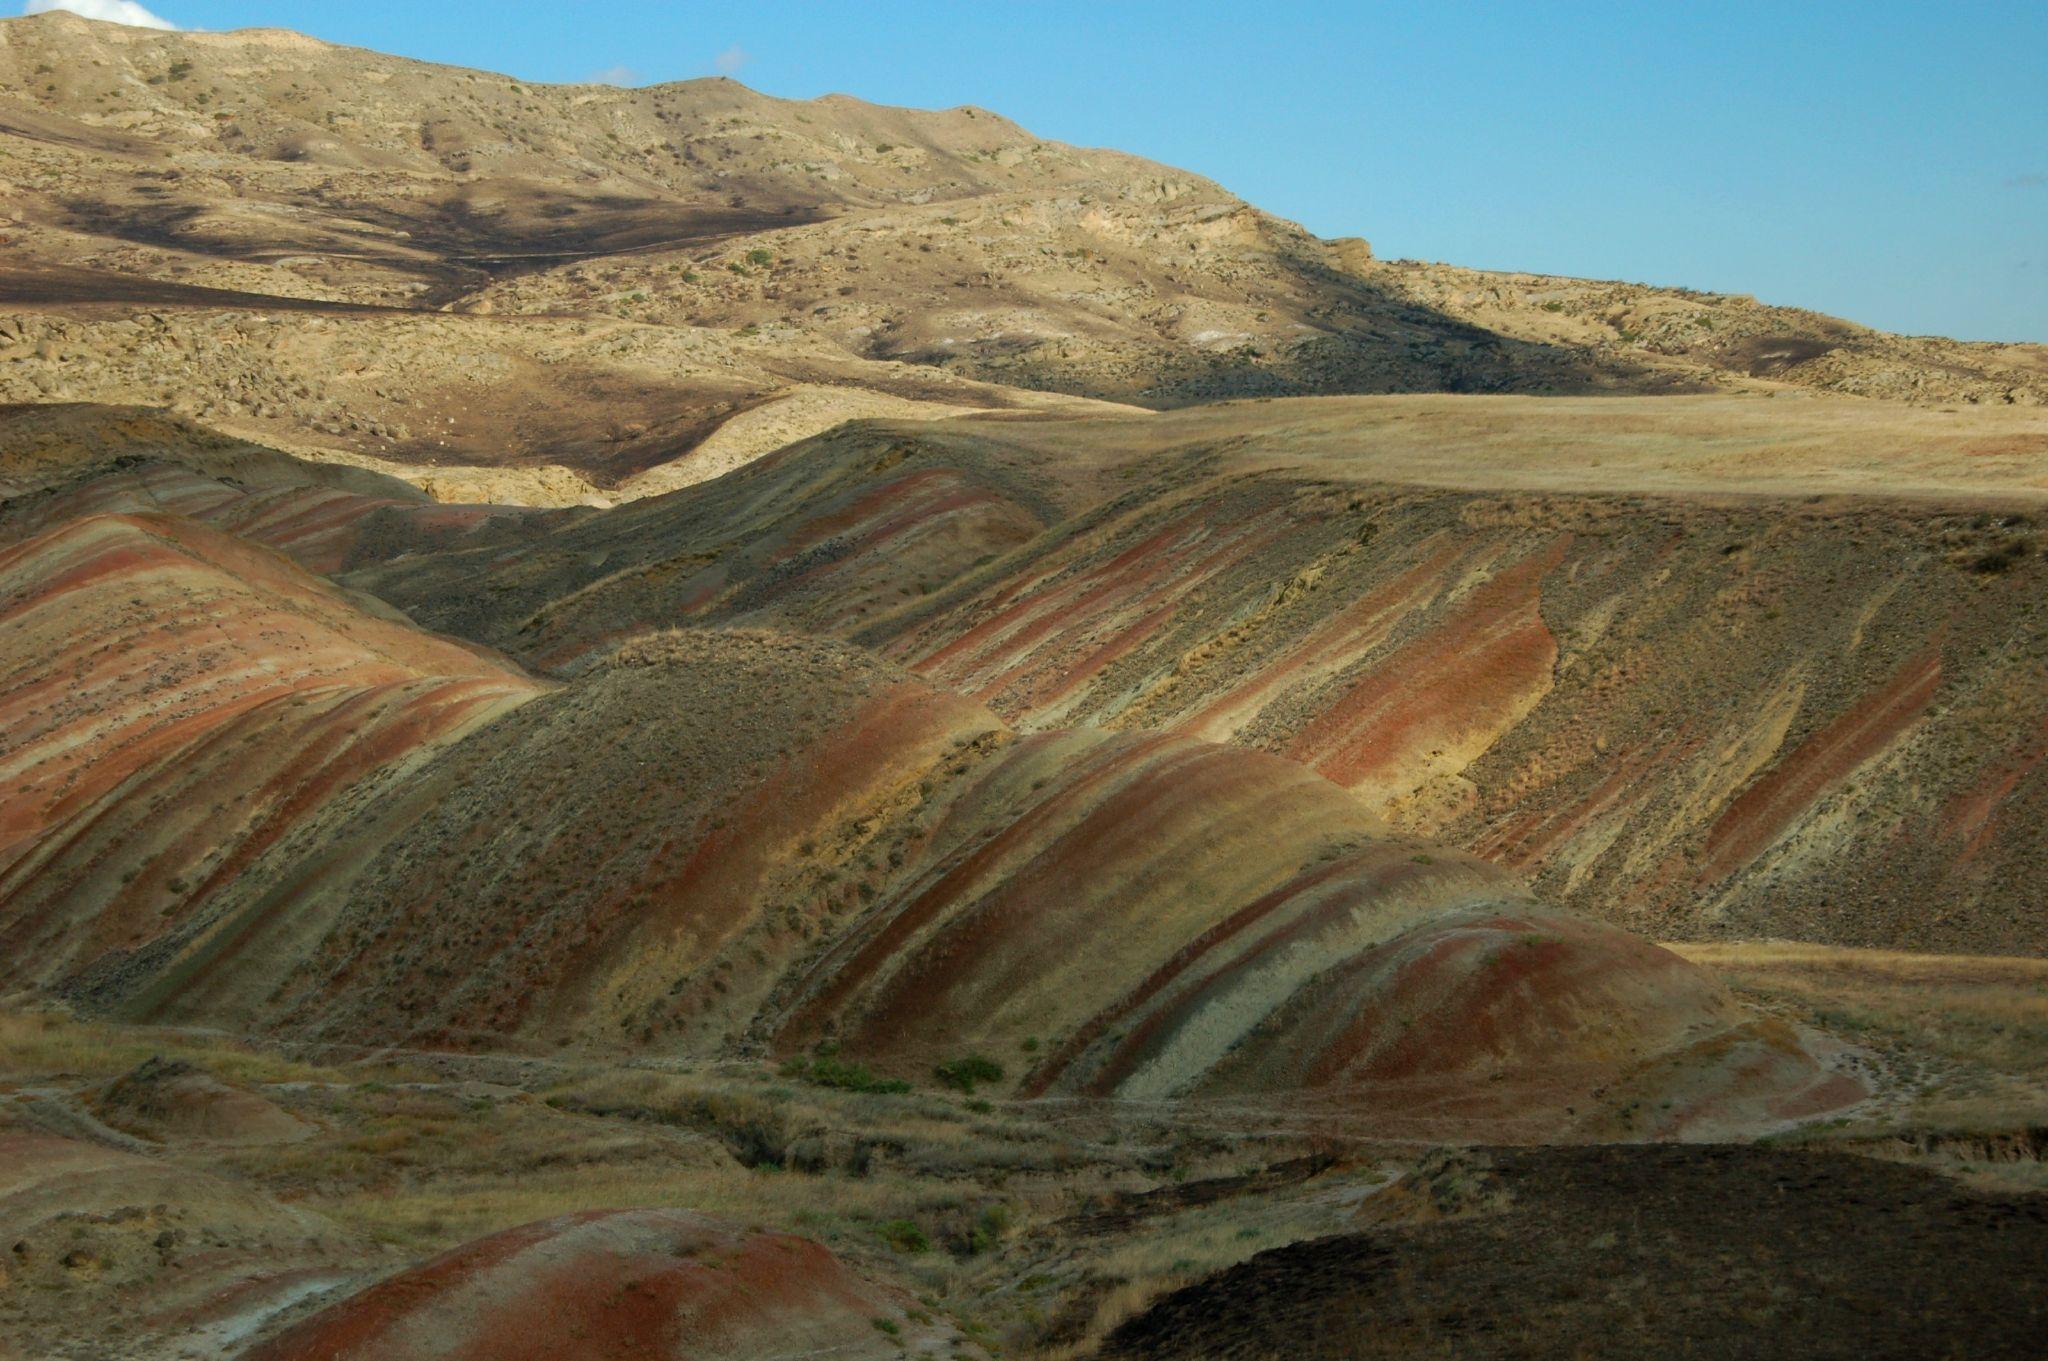 File:Stripes of clay, Udabno, Georgia.jpg - Wikimedia Commons